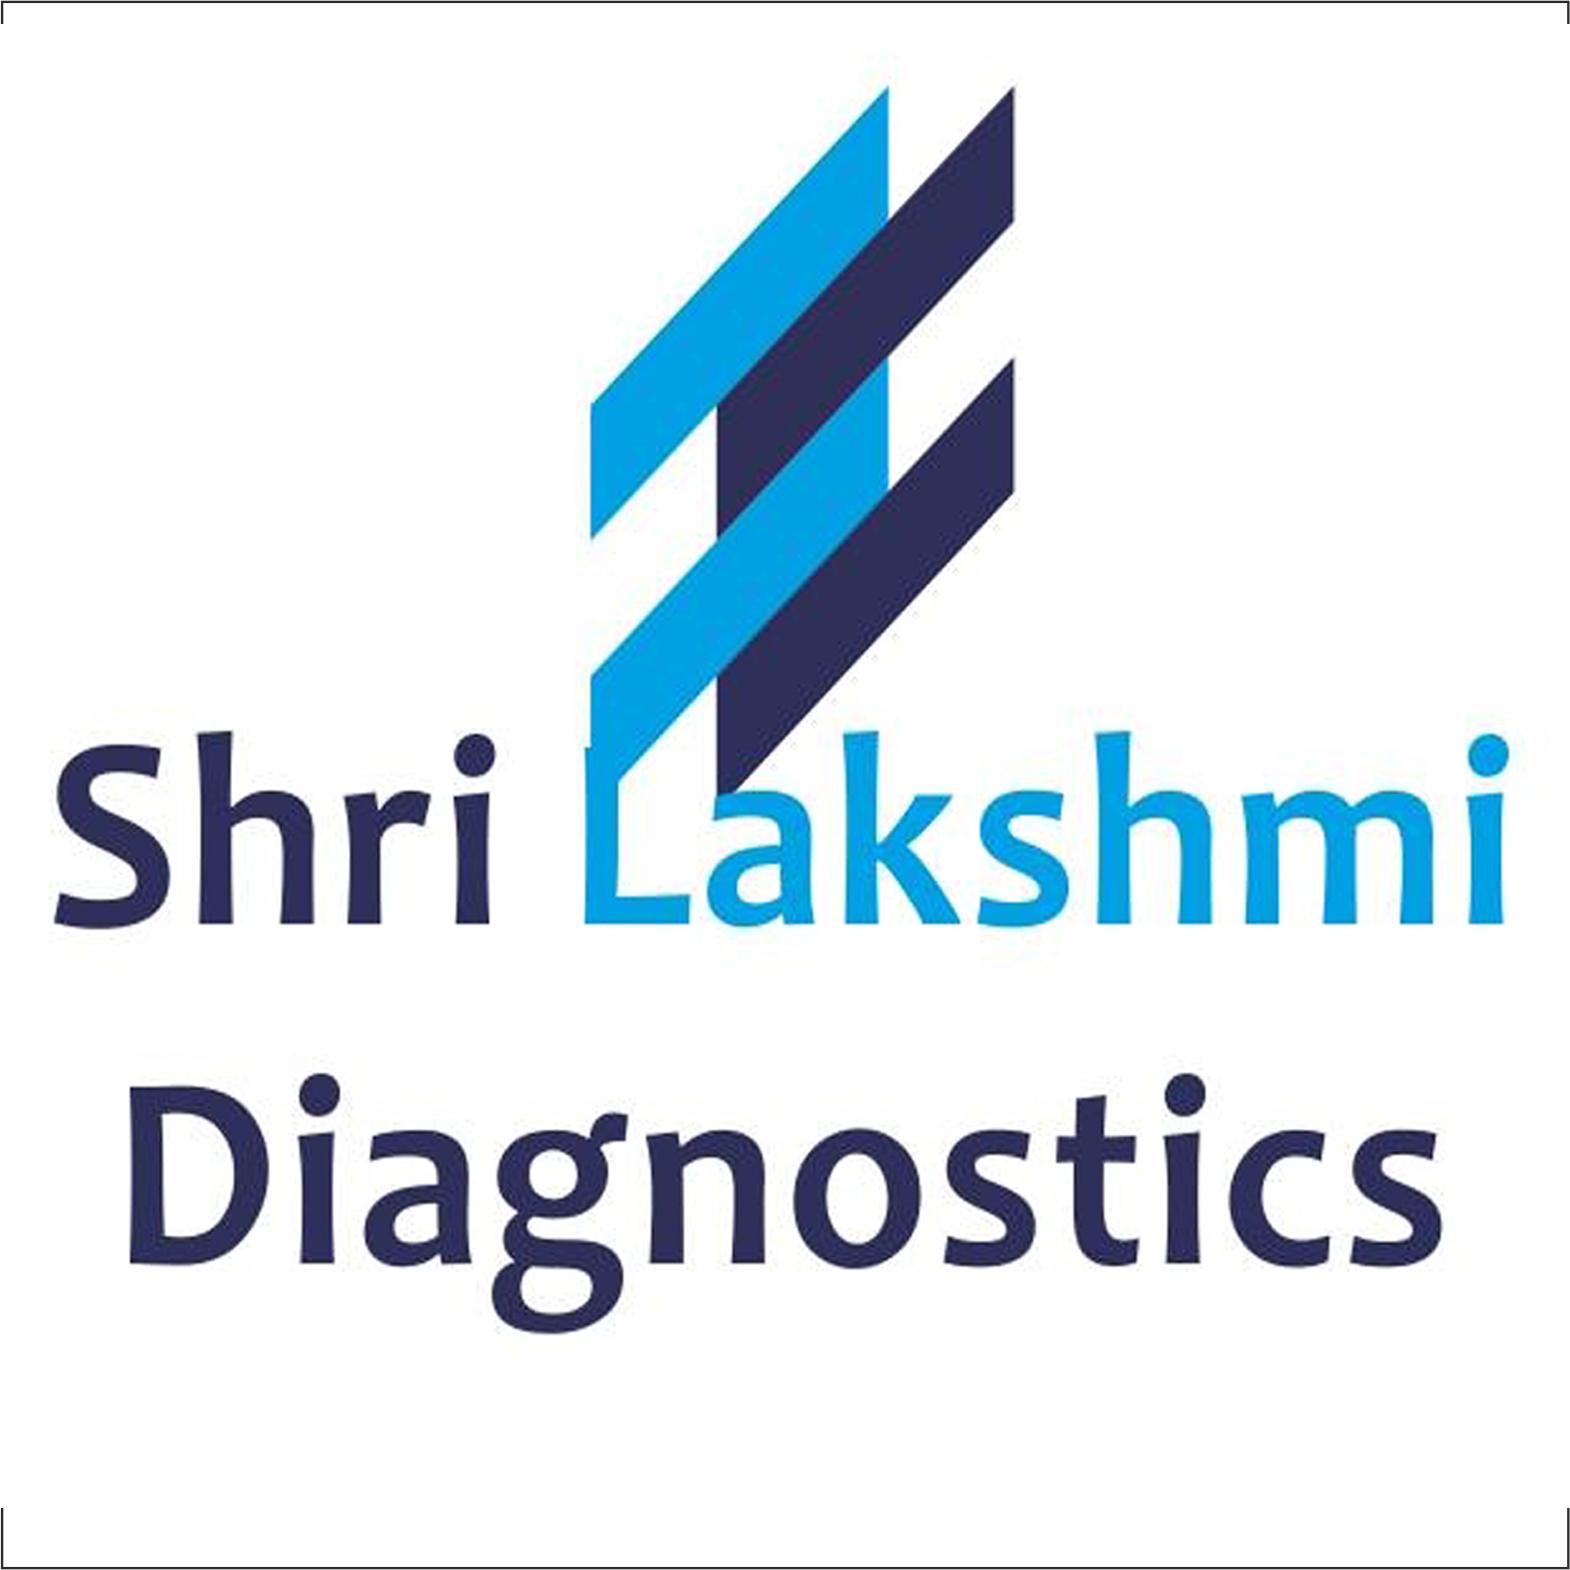 SHRI LAKSHMI DIAGNOSTICS